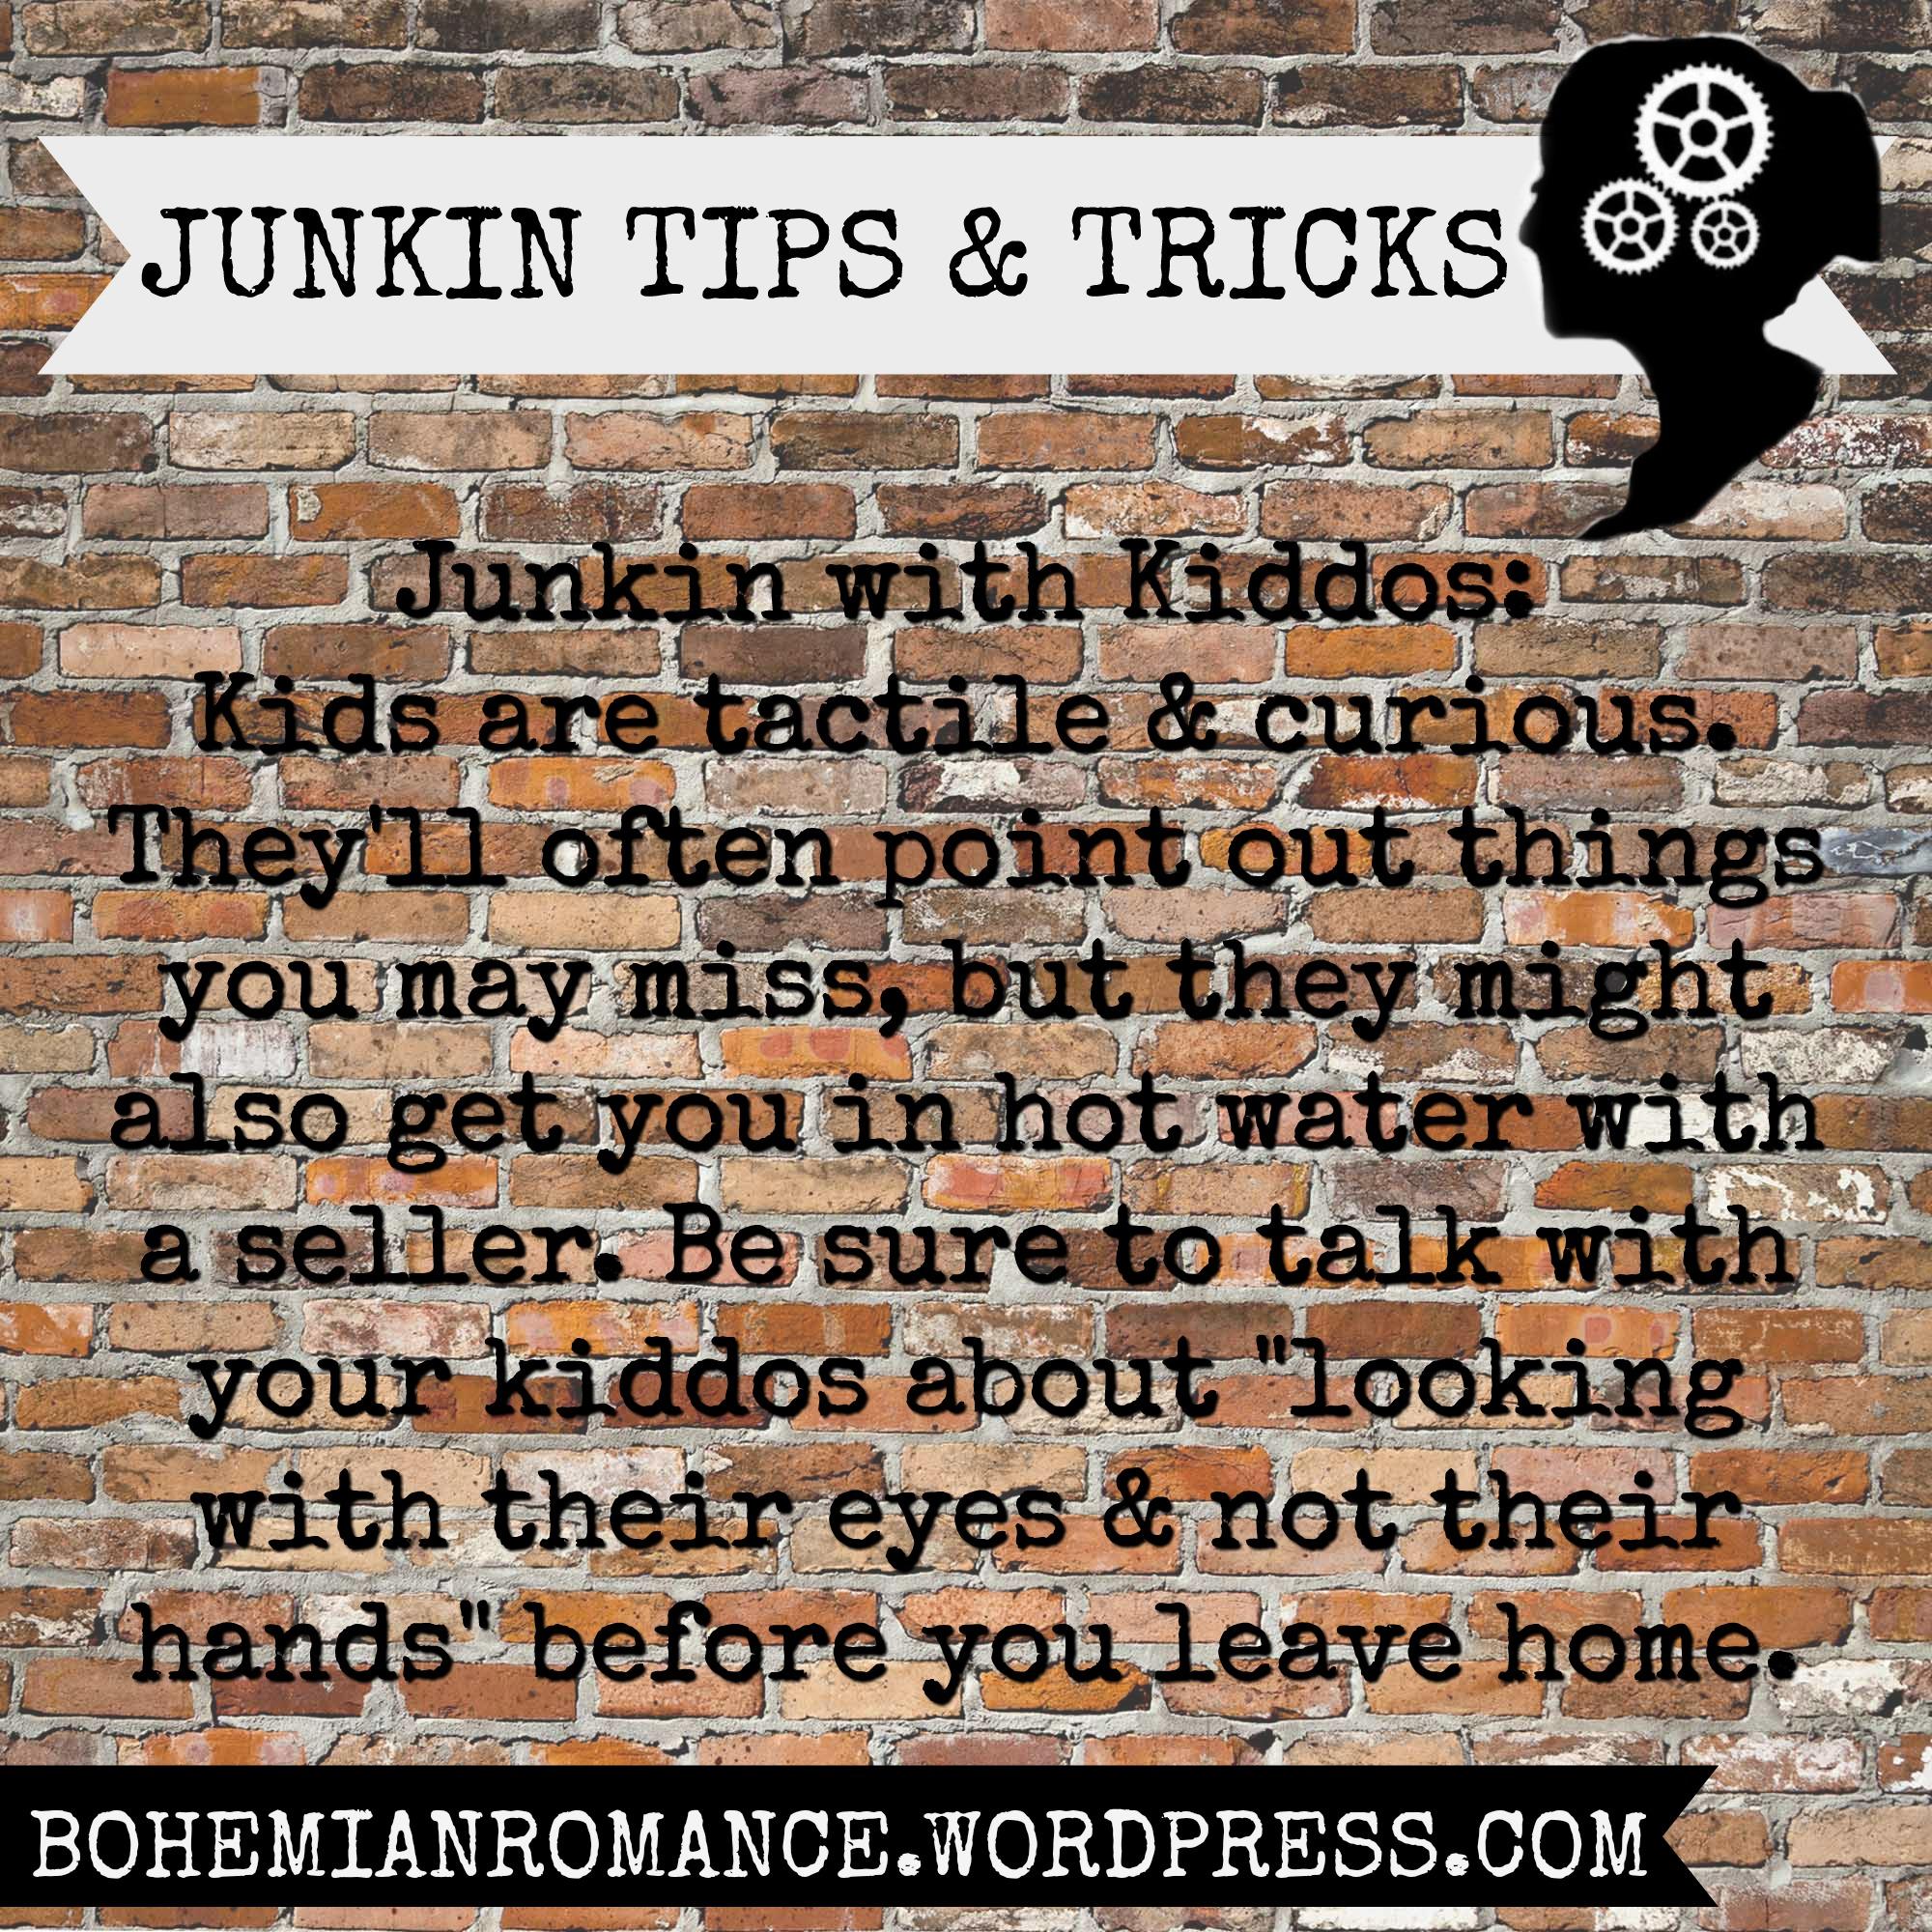 42-junkin-tips-tricks-template